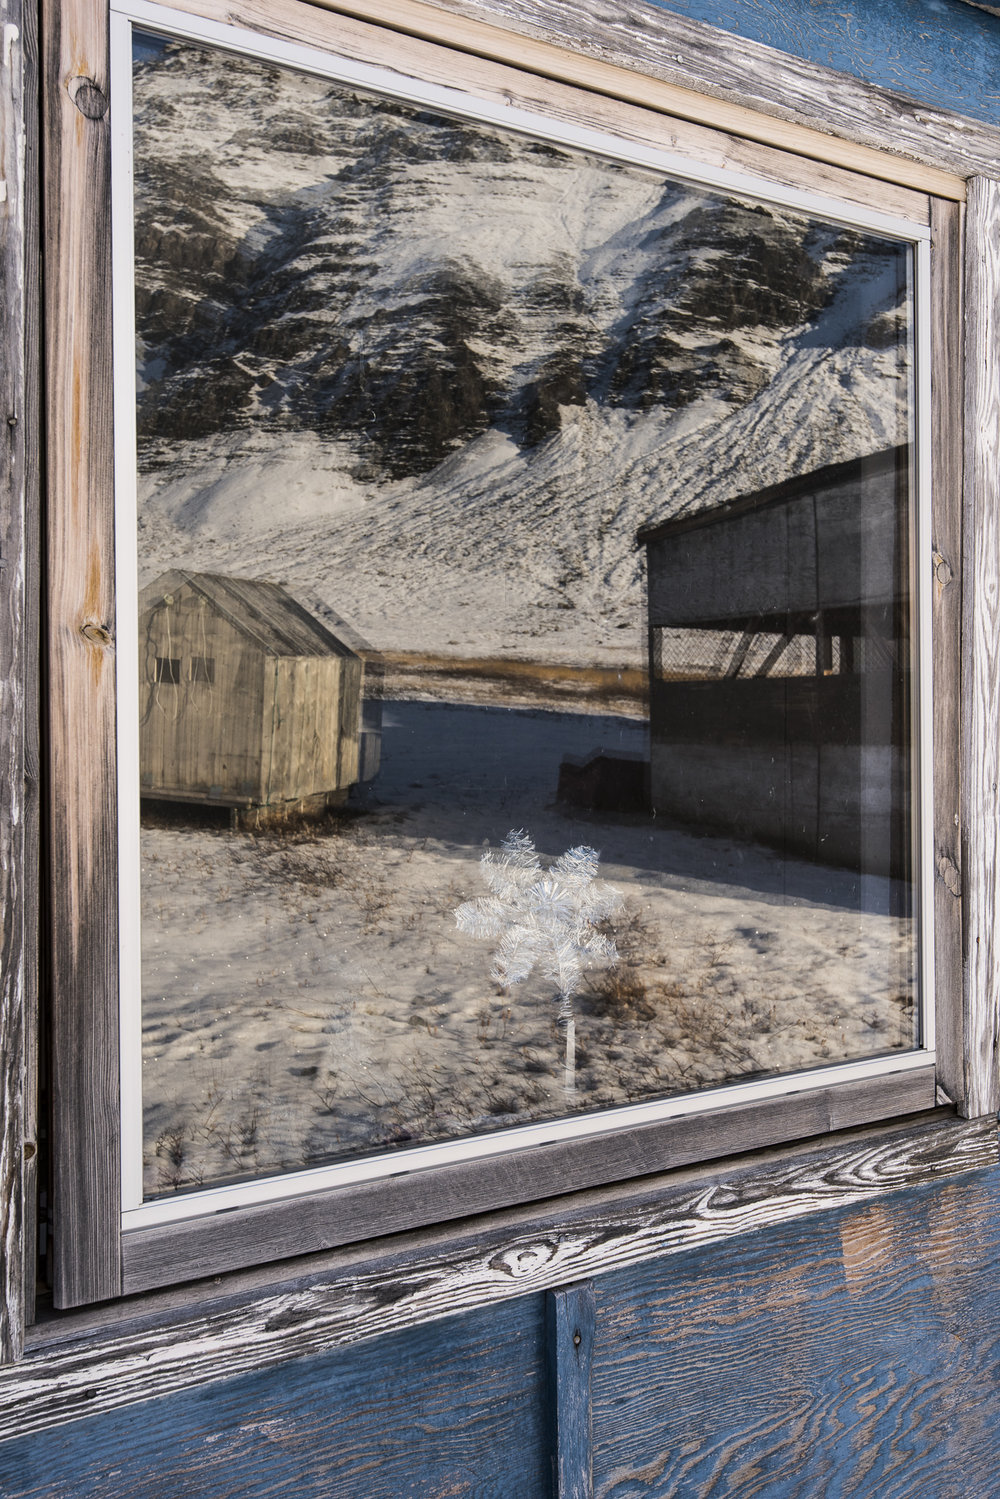 1.Defibaugh_Greenland_Illorsuit_b_2_8.jpg